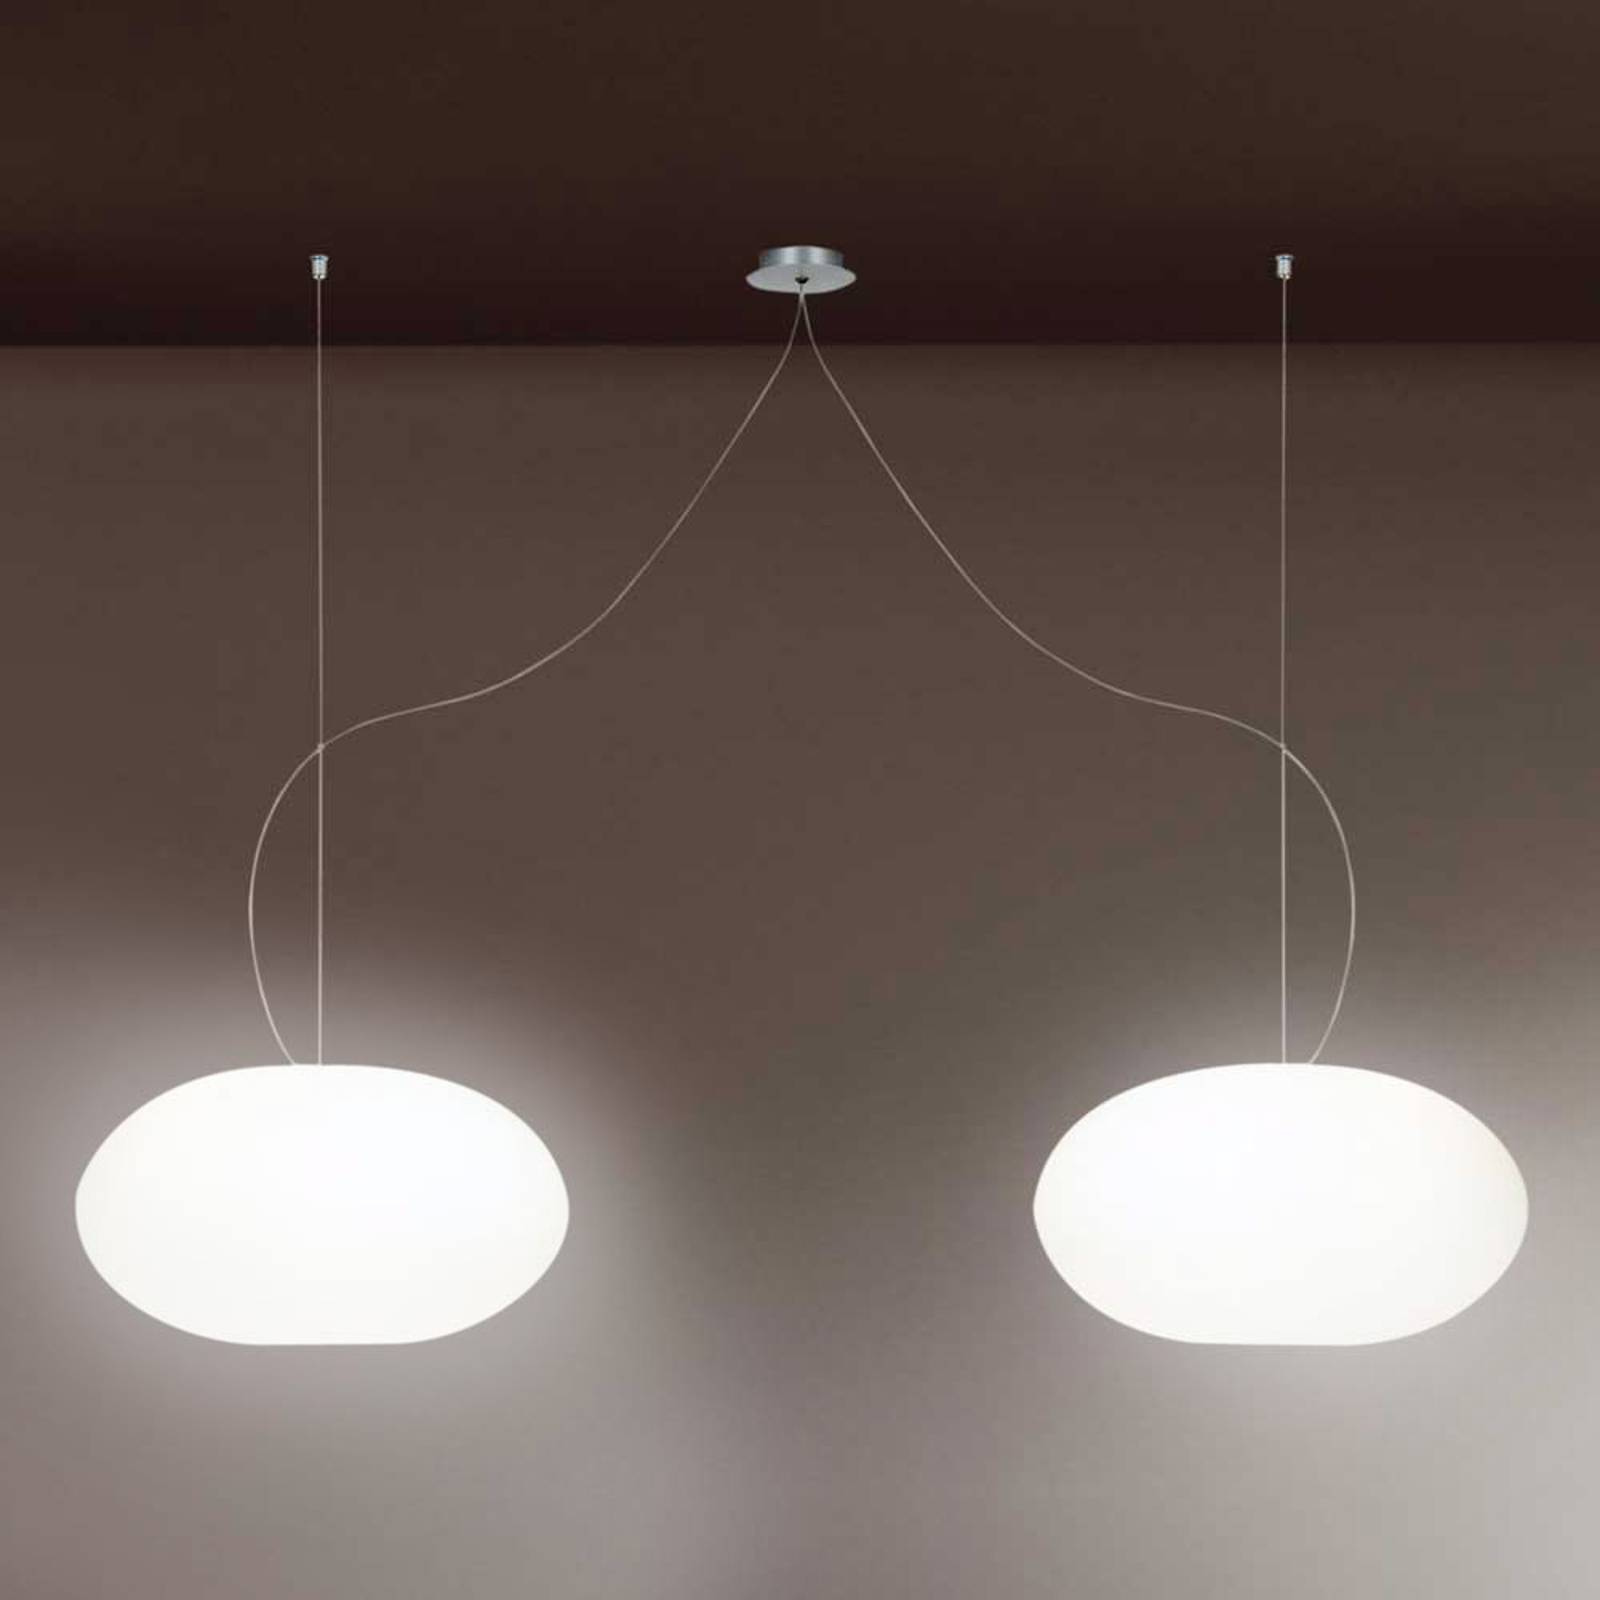 Design-hanglamp AIH, 28 cm, wit glanzend